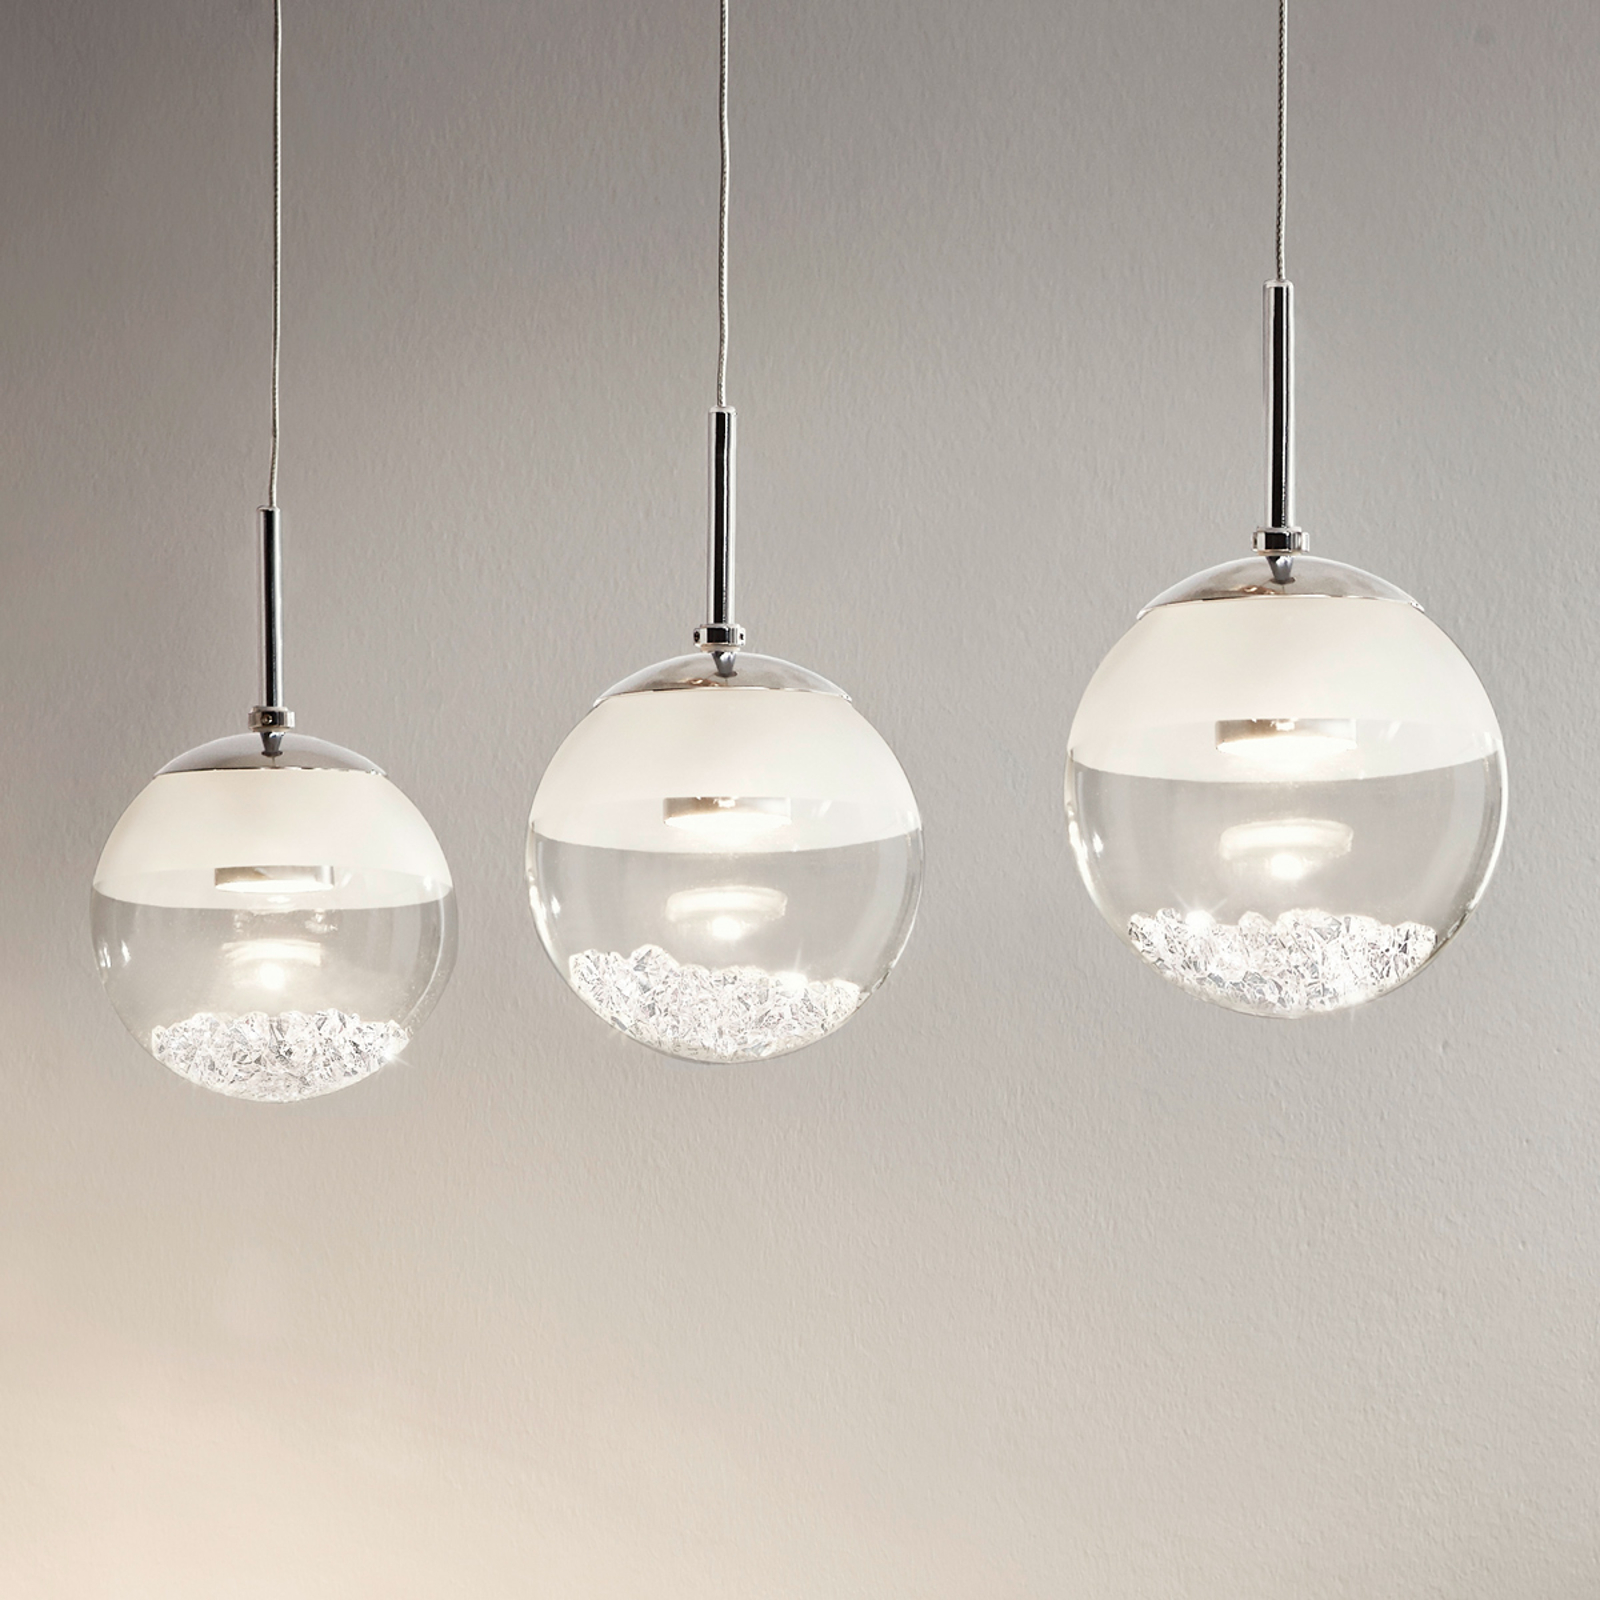 Podlhovasté závesné LED svietidlo Montefio krištáľ_3031617_1